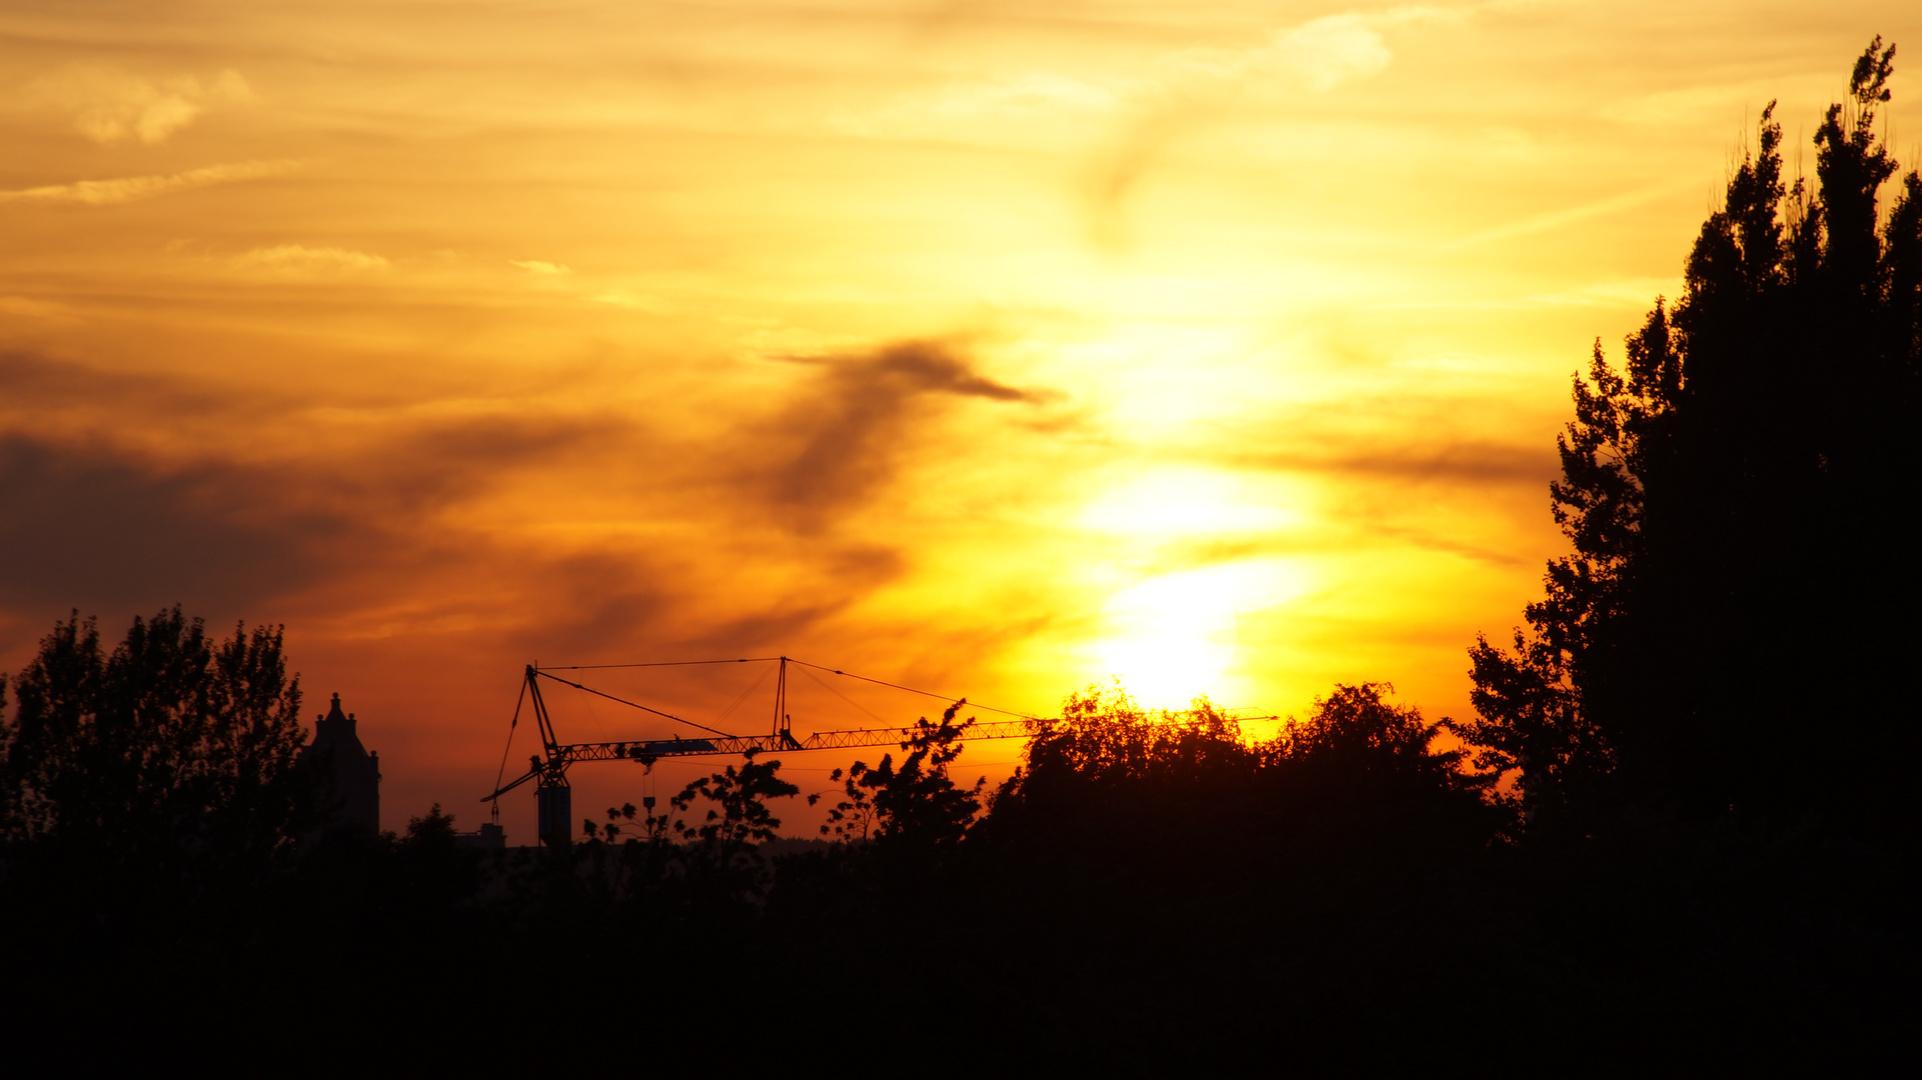 Hamburg Sun goes down